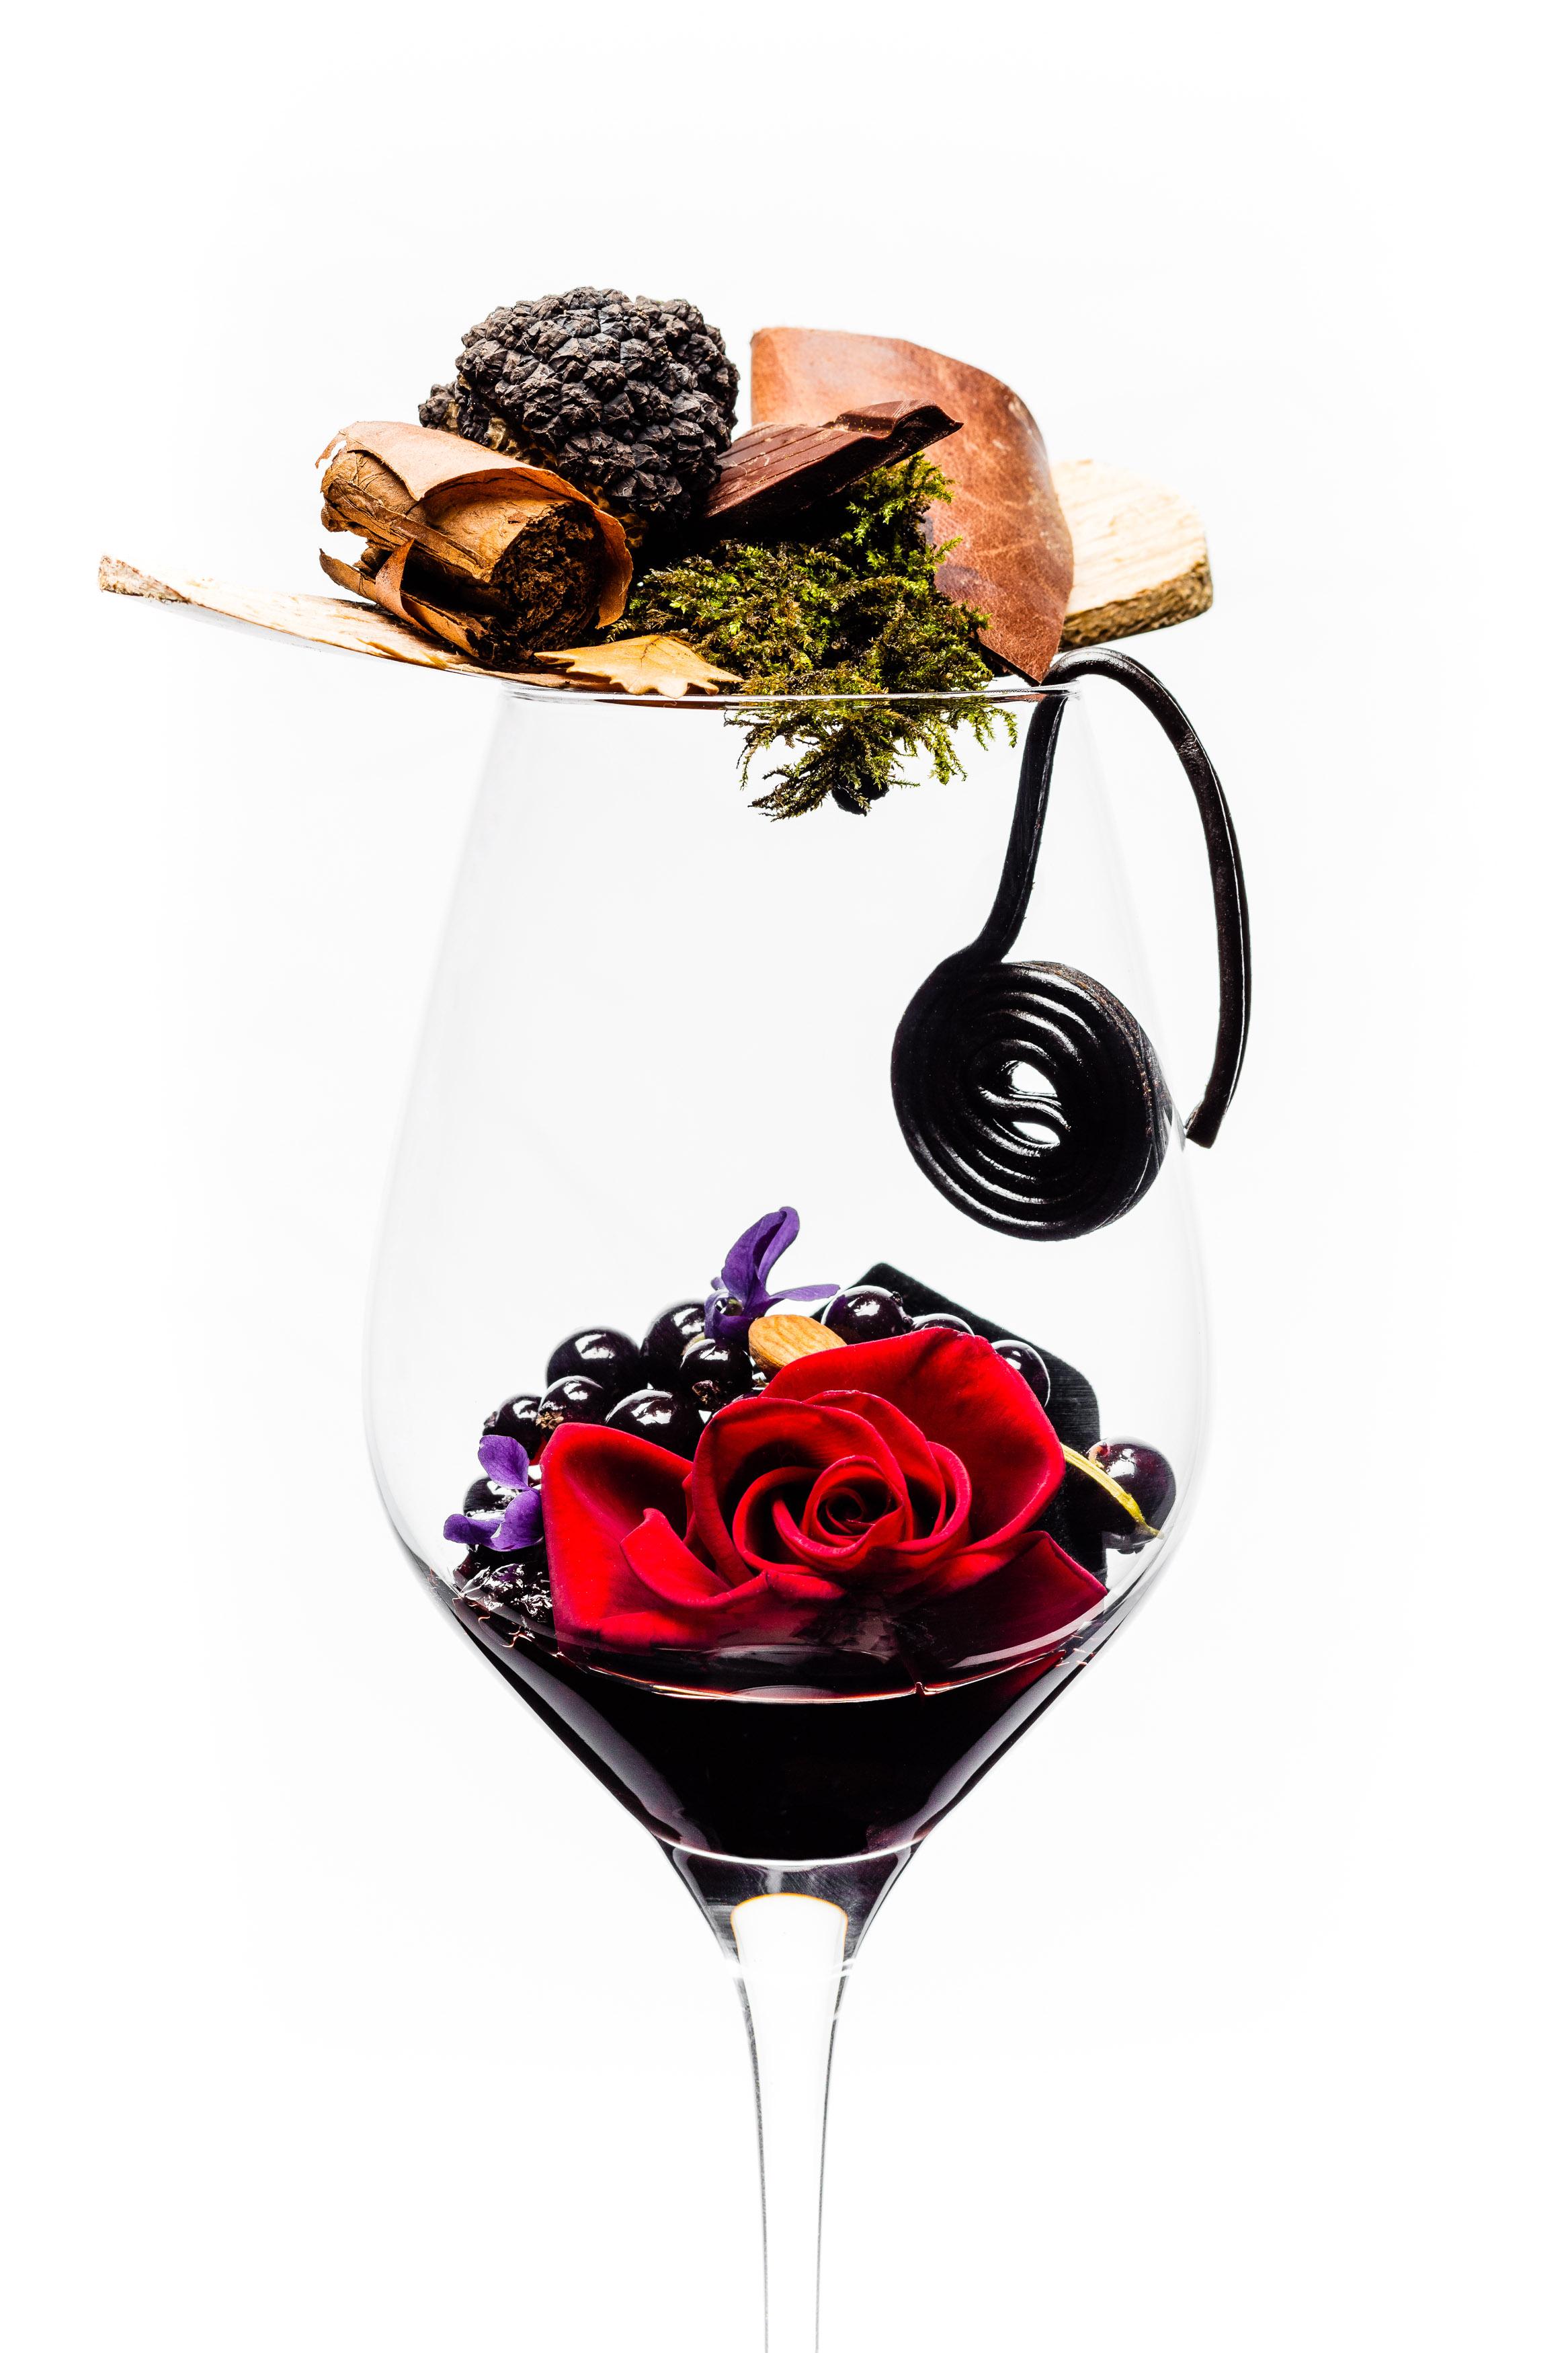 Crashkurs Wein 28: Cabernet Sauvignon